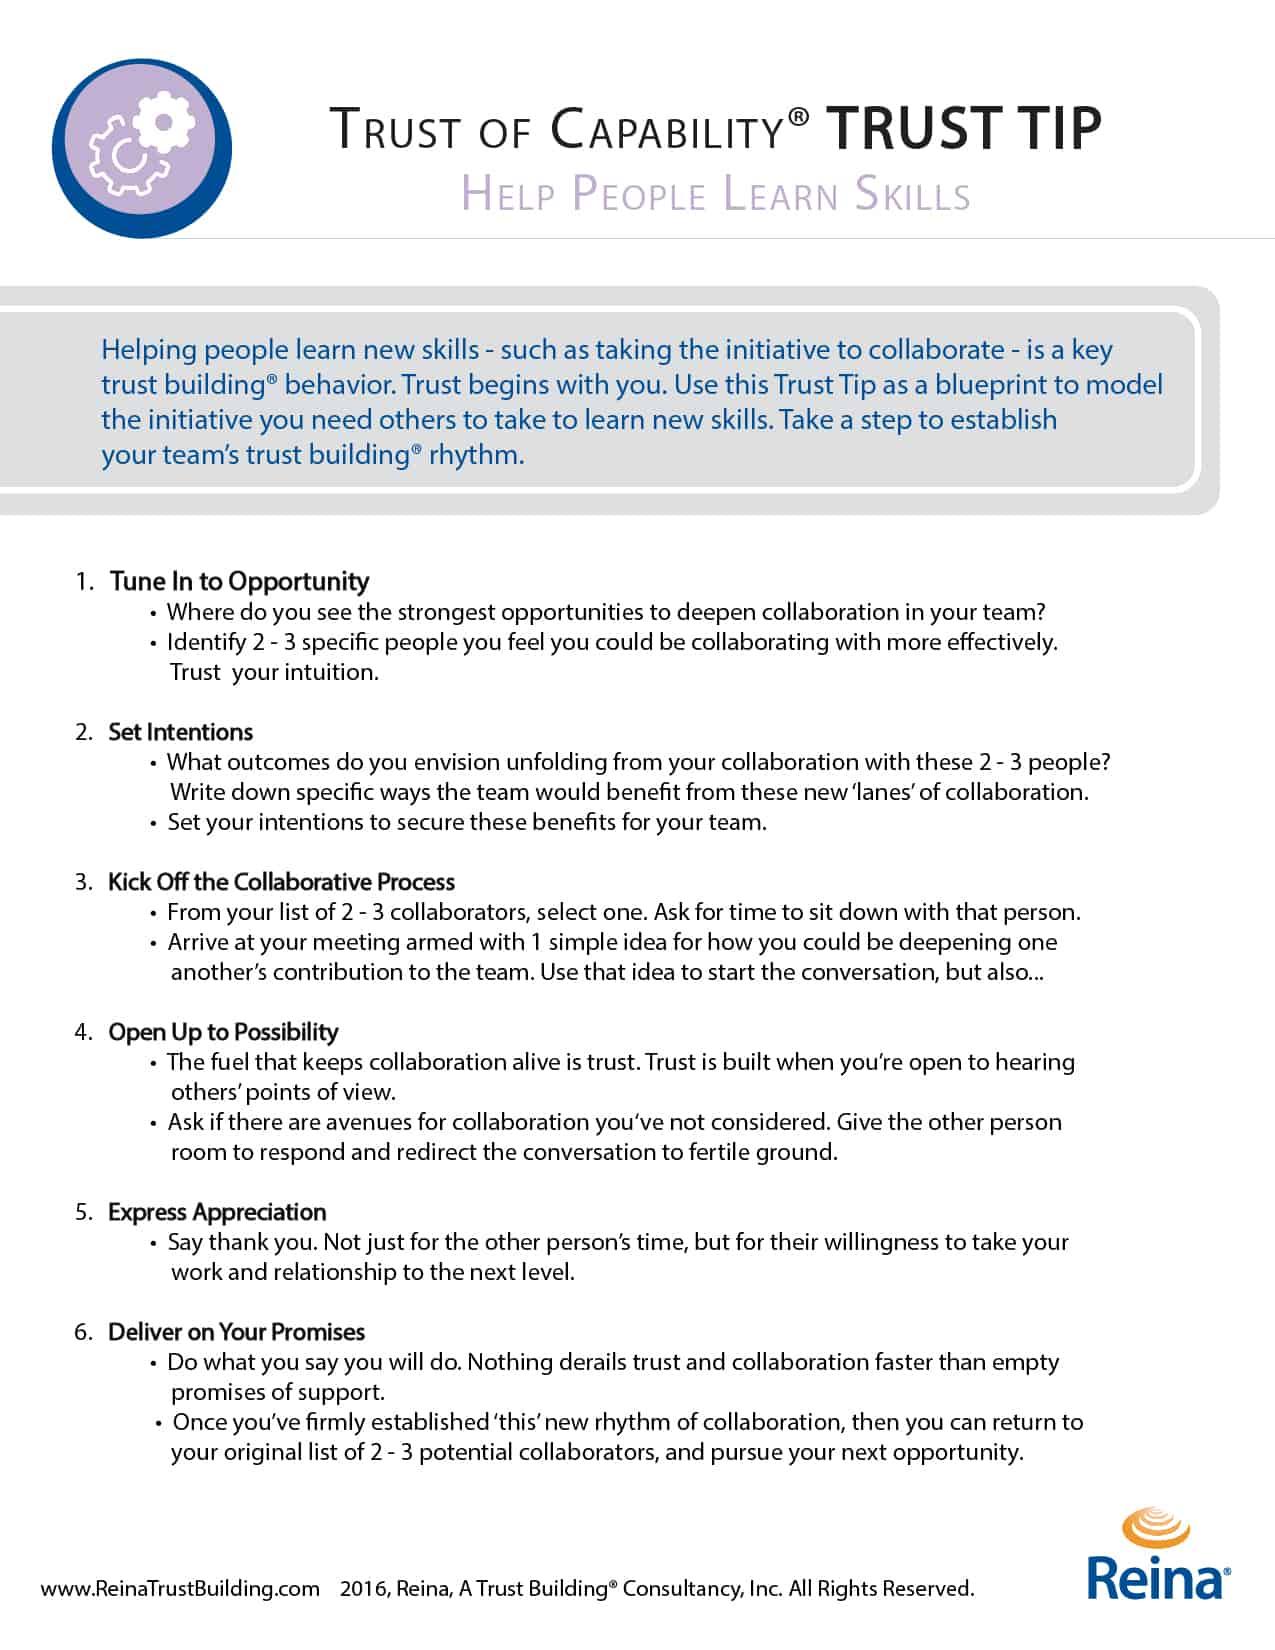 help people learn skills build trust at work part 3 reina your trust tip help people learn new skills